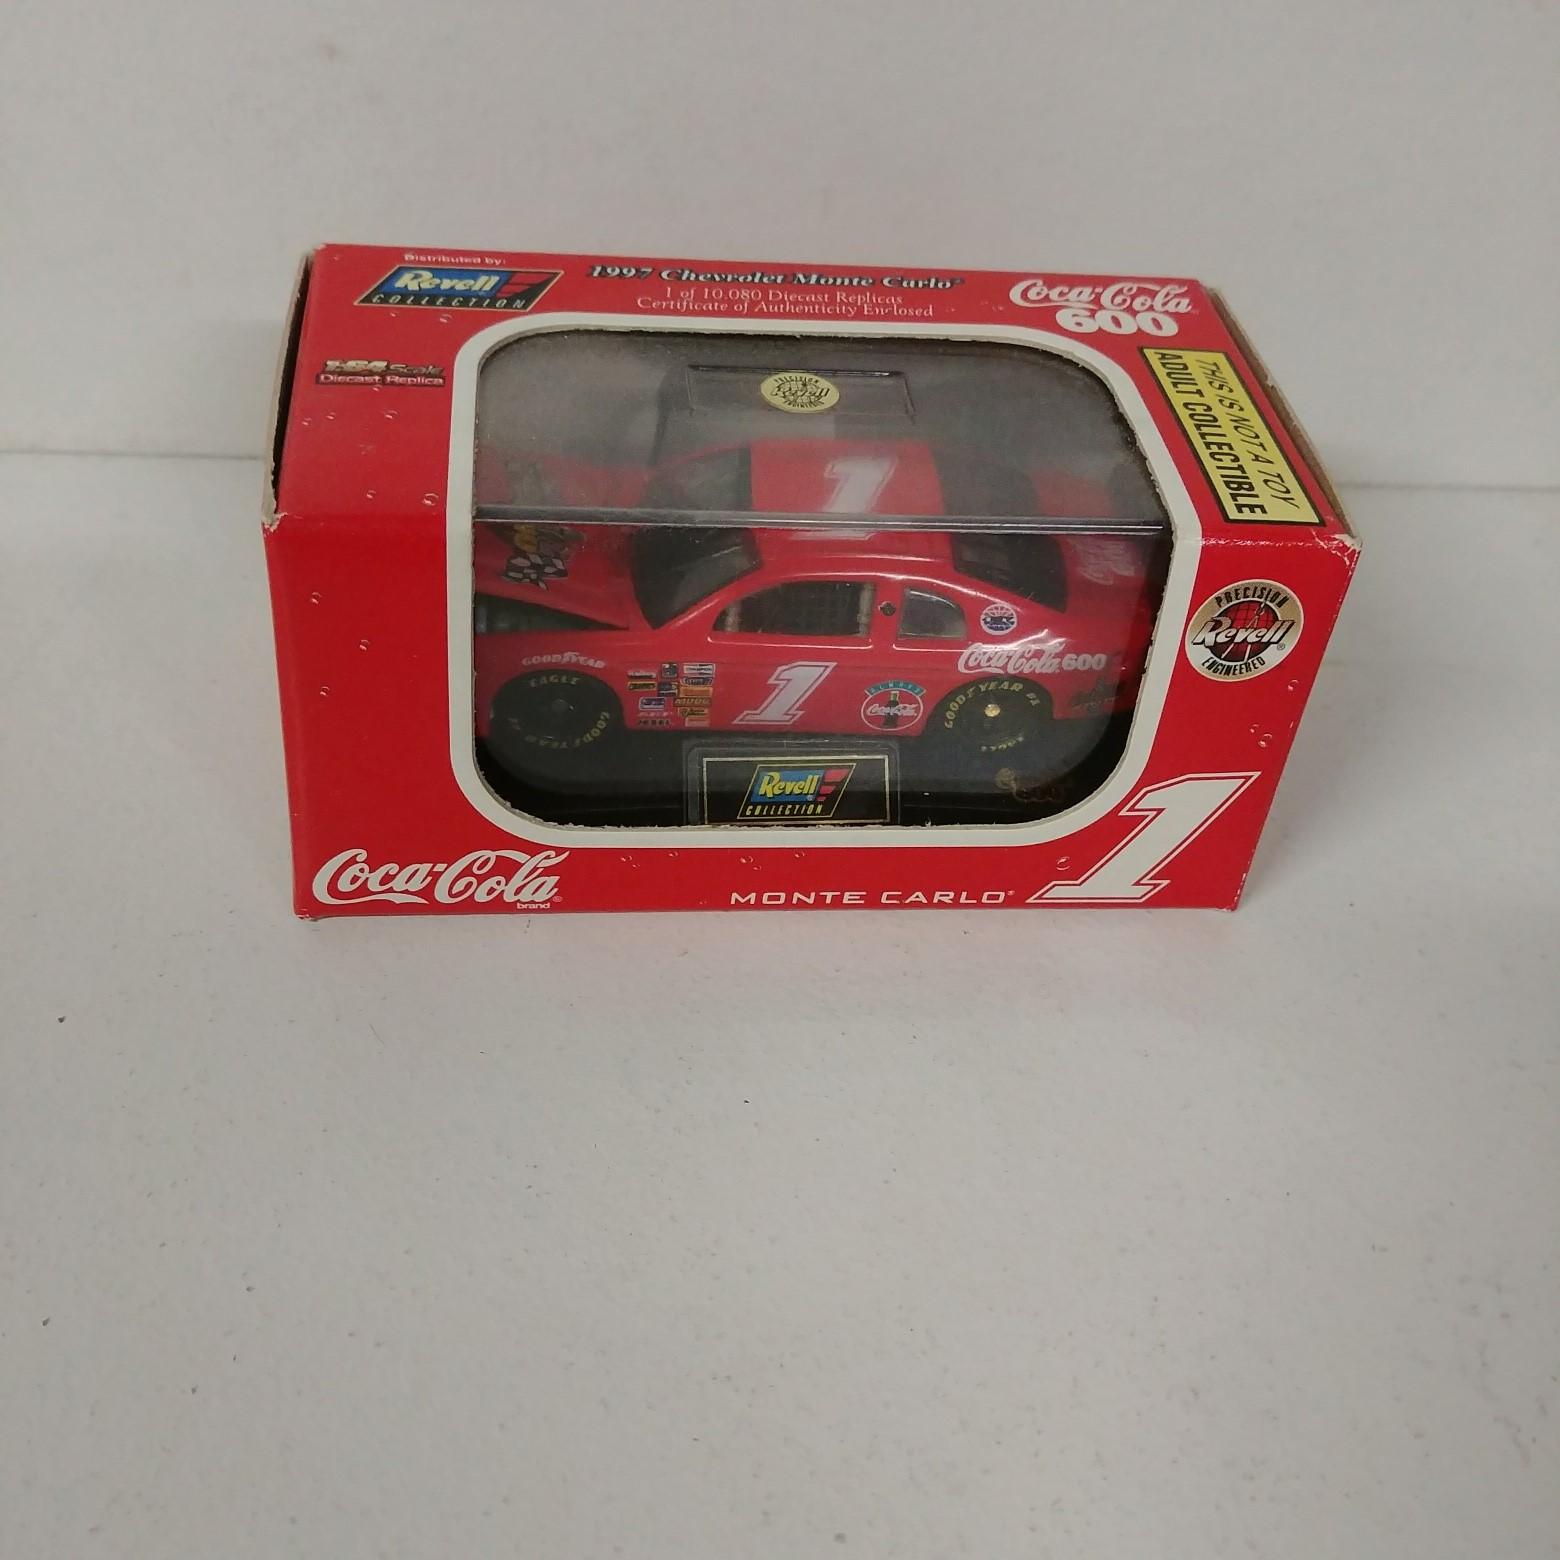 1997 Coca-Cola 600 1/64th Event car